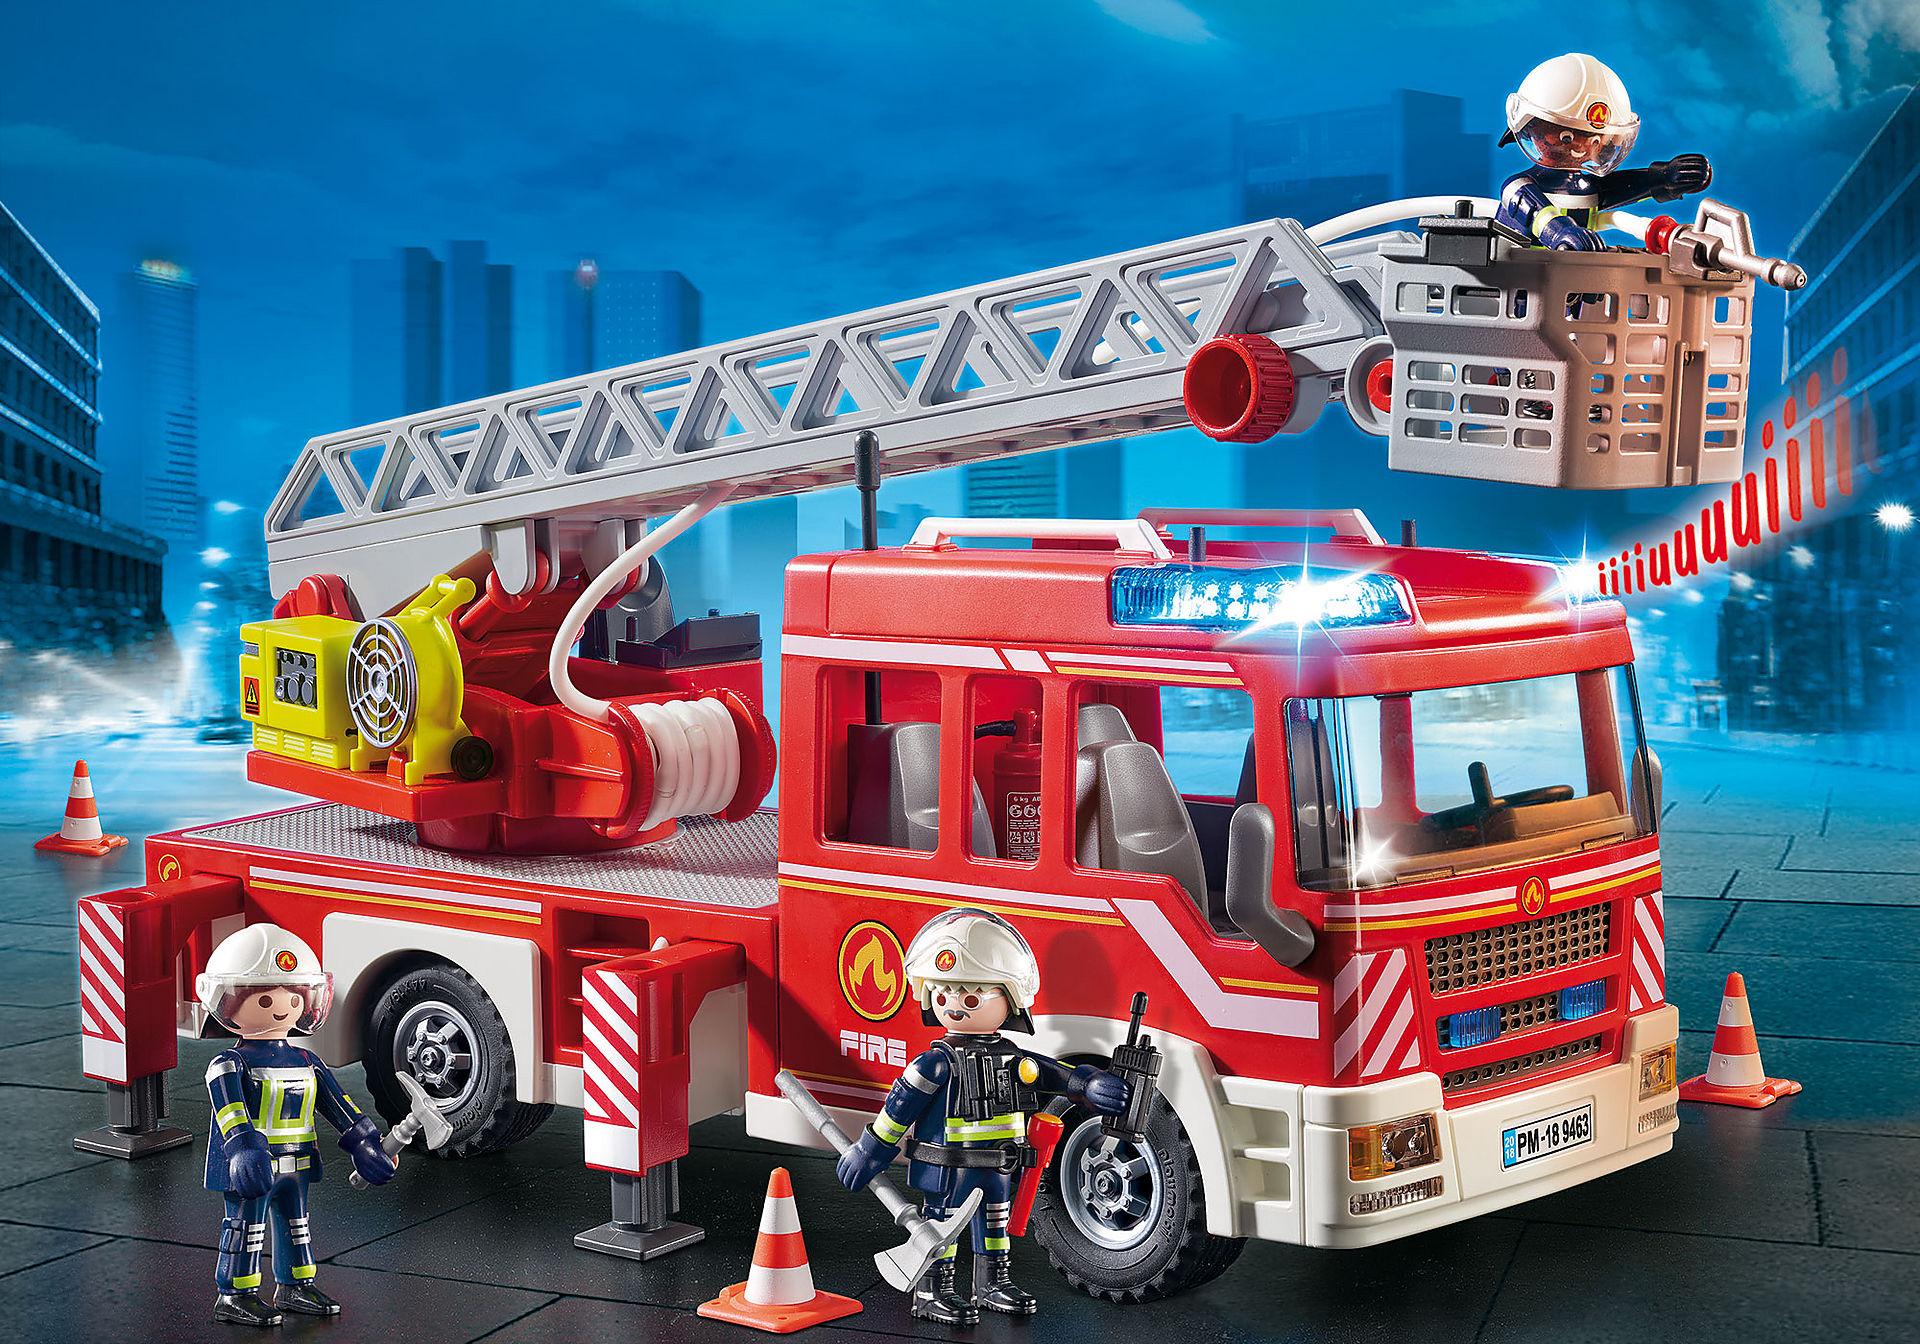 9463 Fire Ladder Unit zoom image1